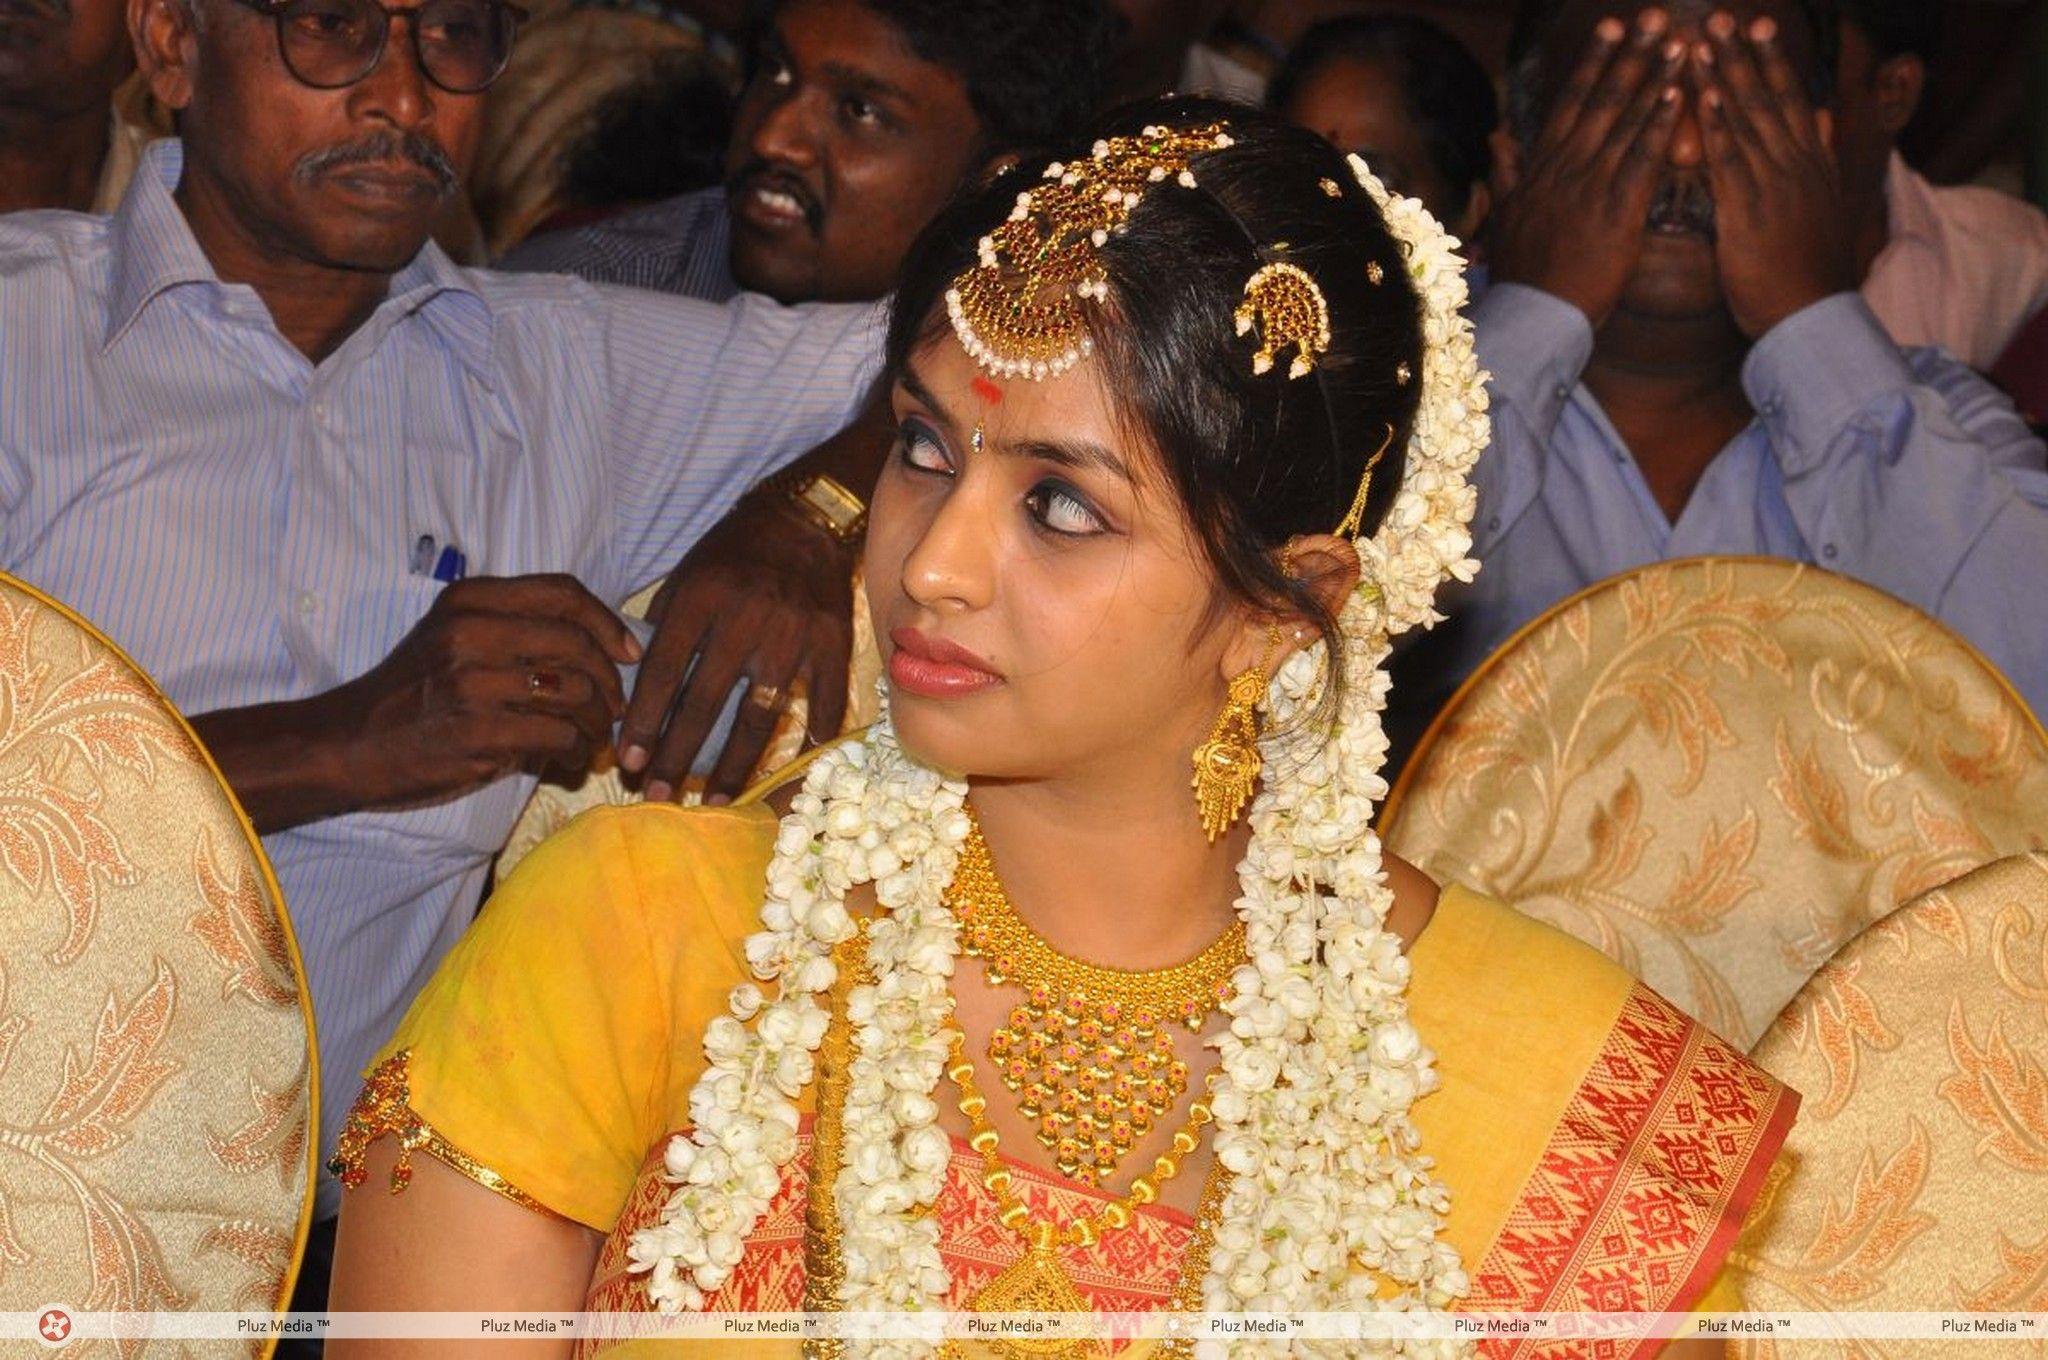 Director Jyothi Krishna - Aishwarya Wedding Stills for Jyothi Krishna Director  157uhy